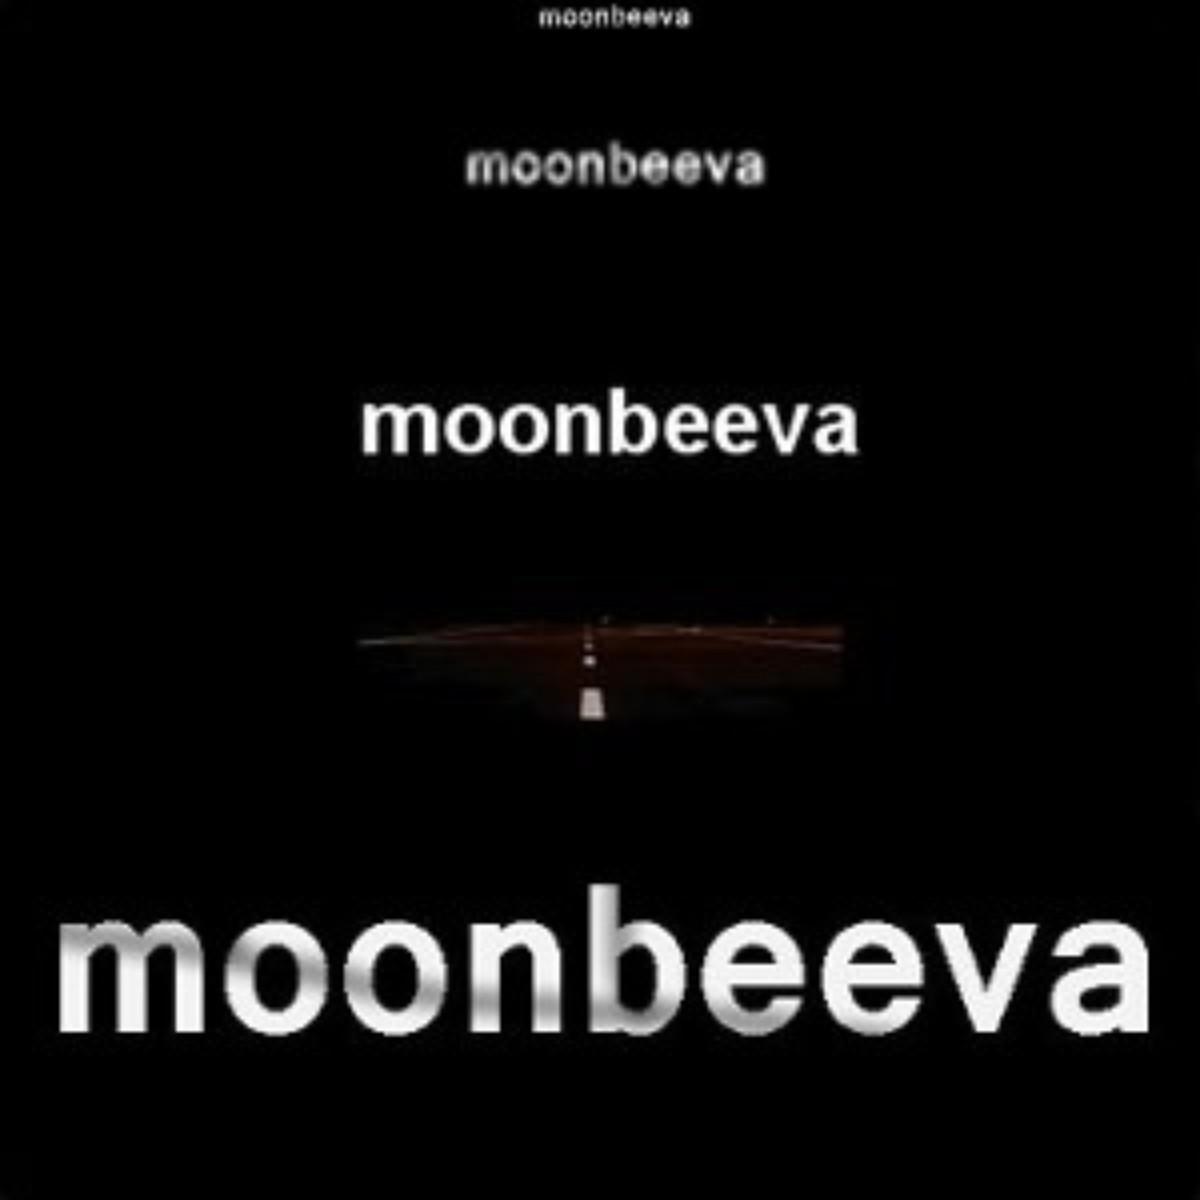 Moonbeeva